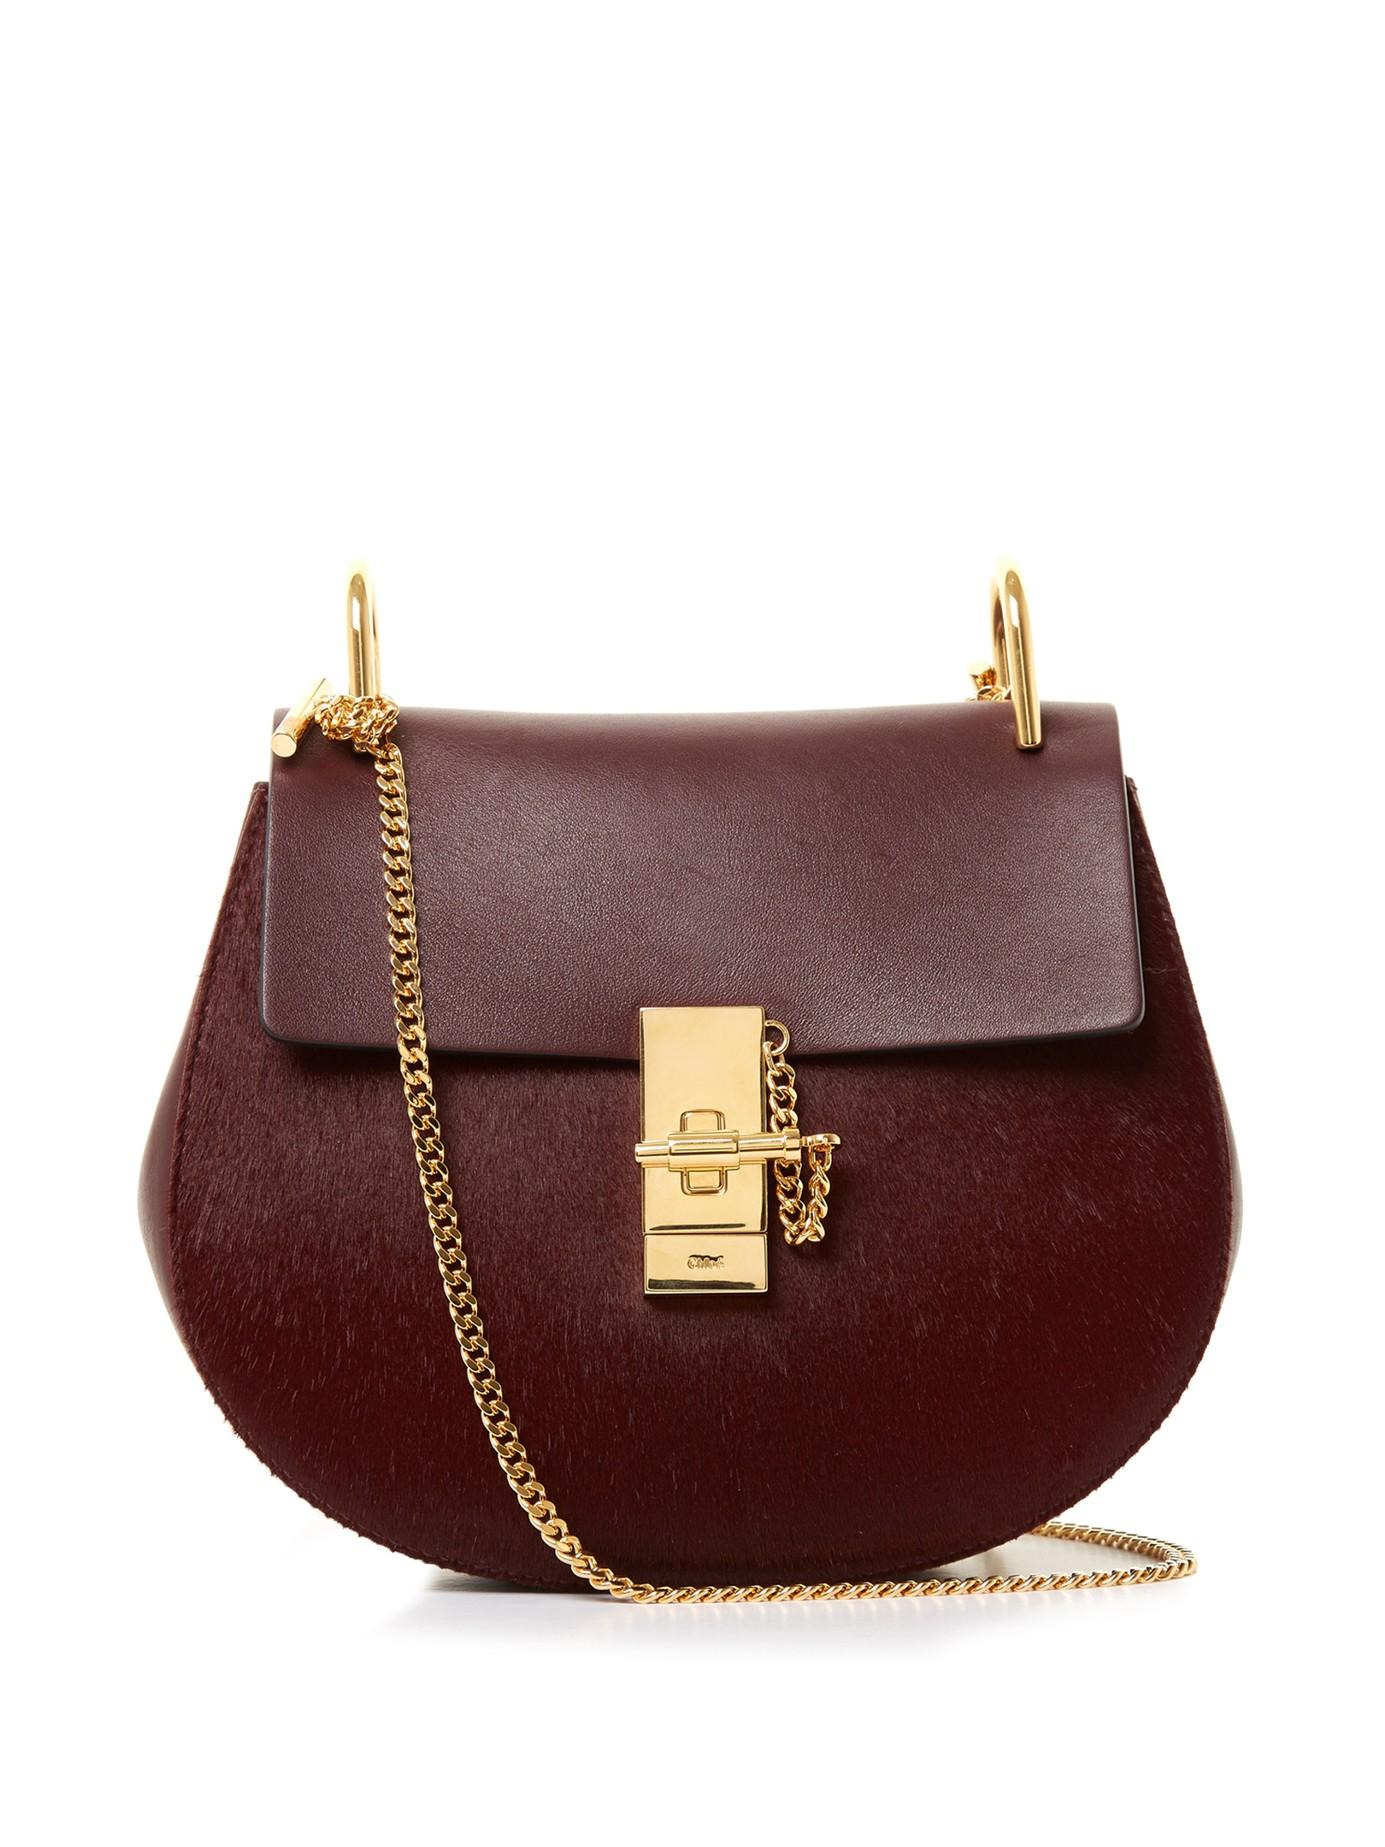 793c6134dd0e Chloé Drew Small Calf-Hair And Leather Cross-Body Bag in Purple - Lyst